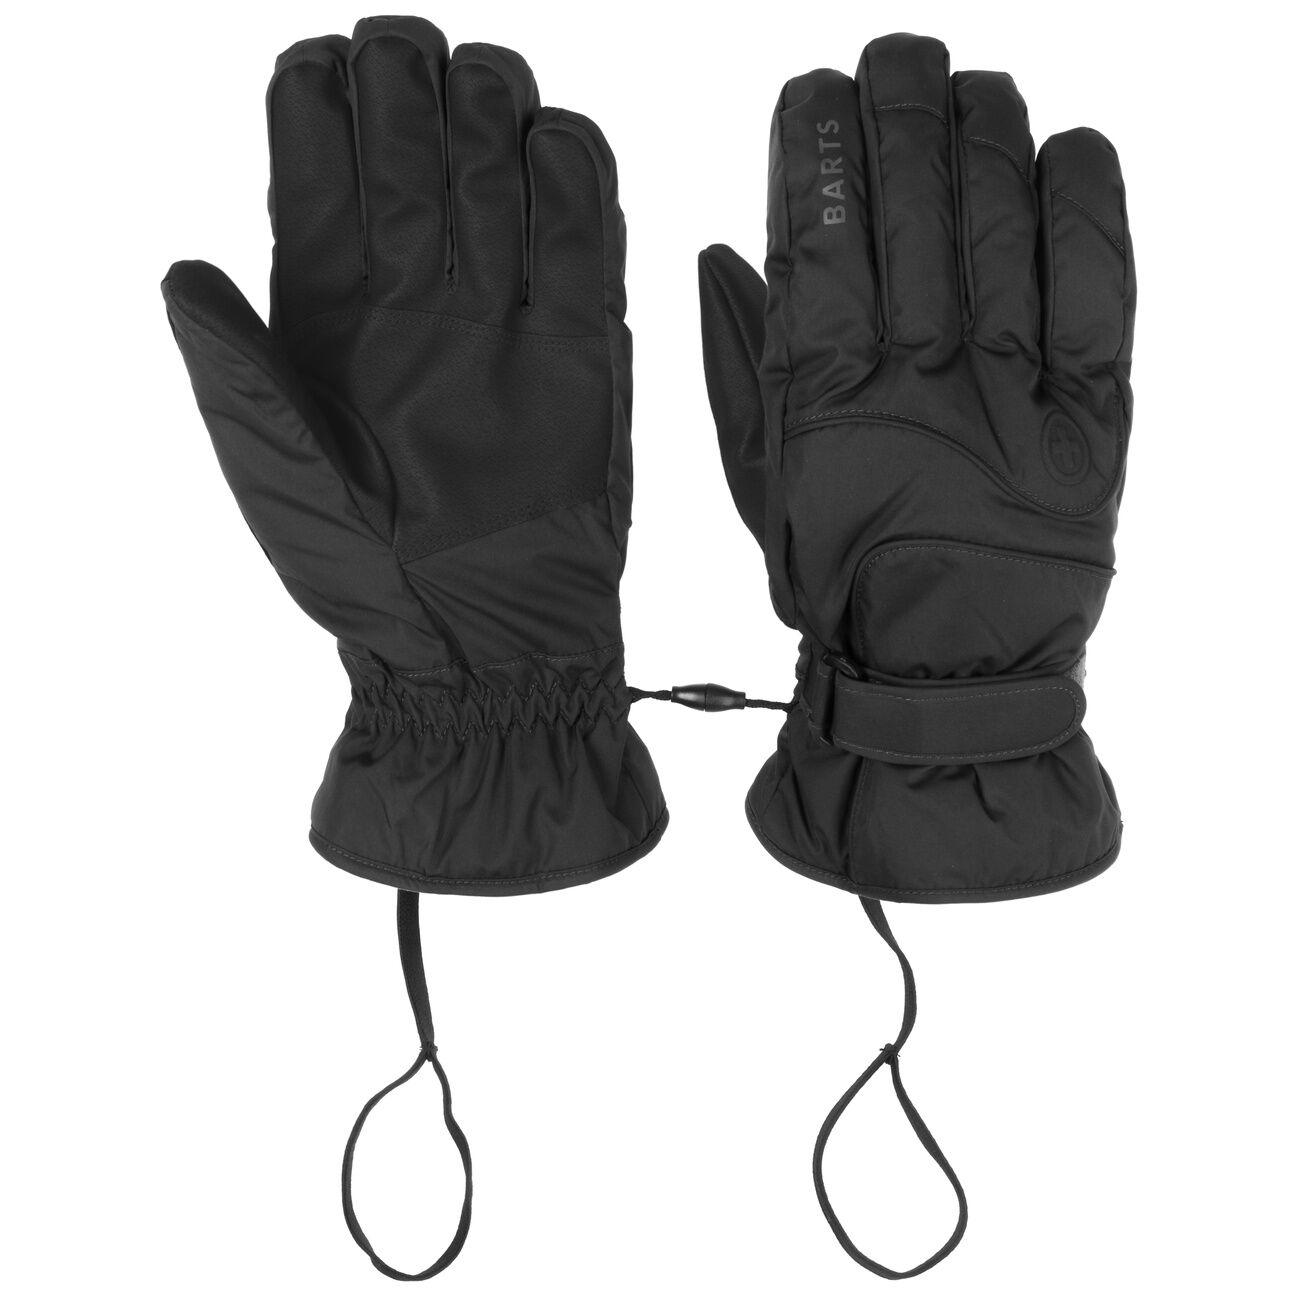 Barts Basic Ski Handschoenen by ...